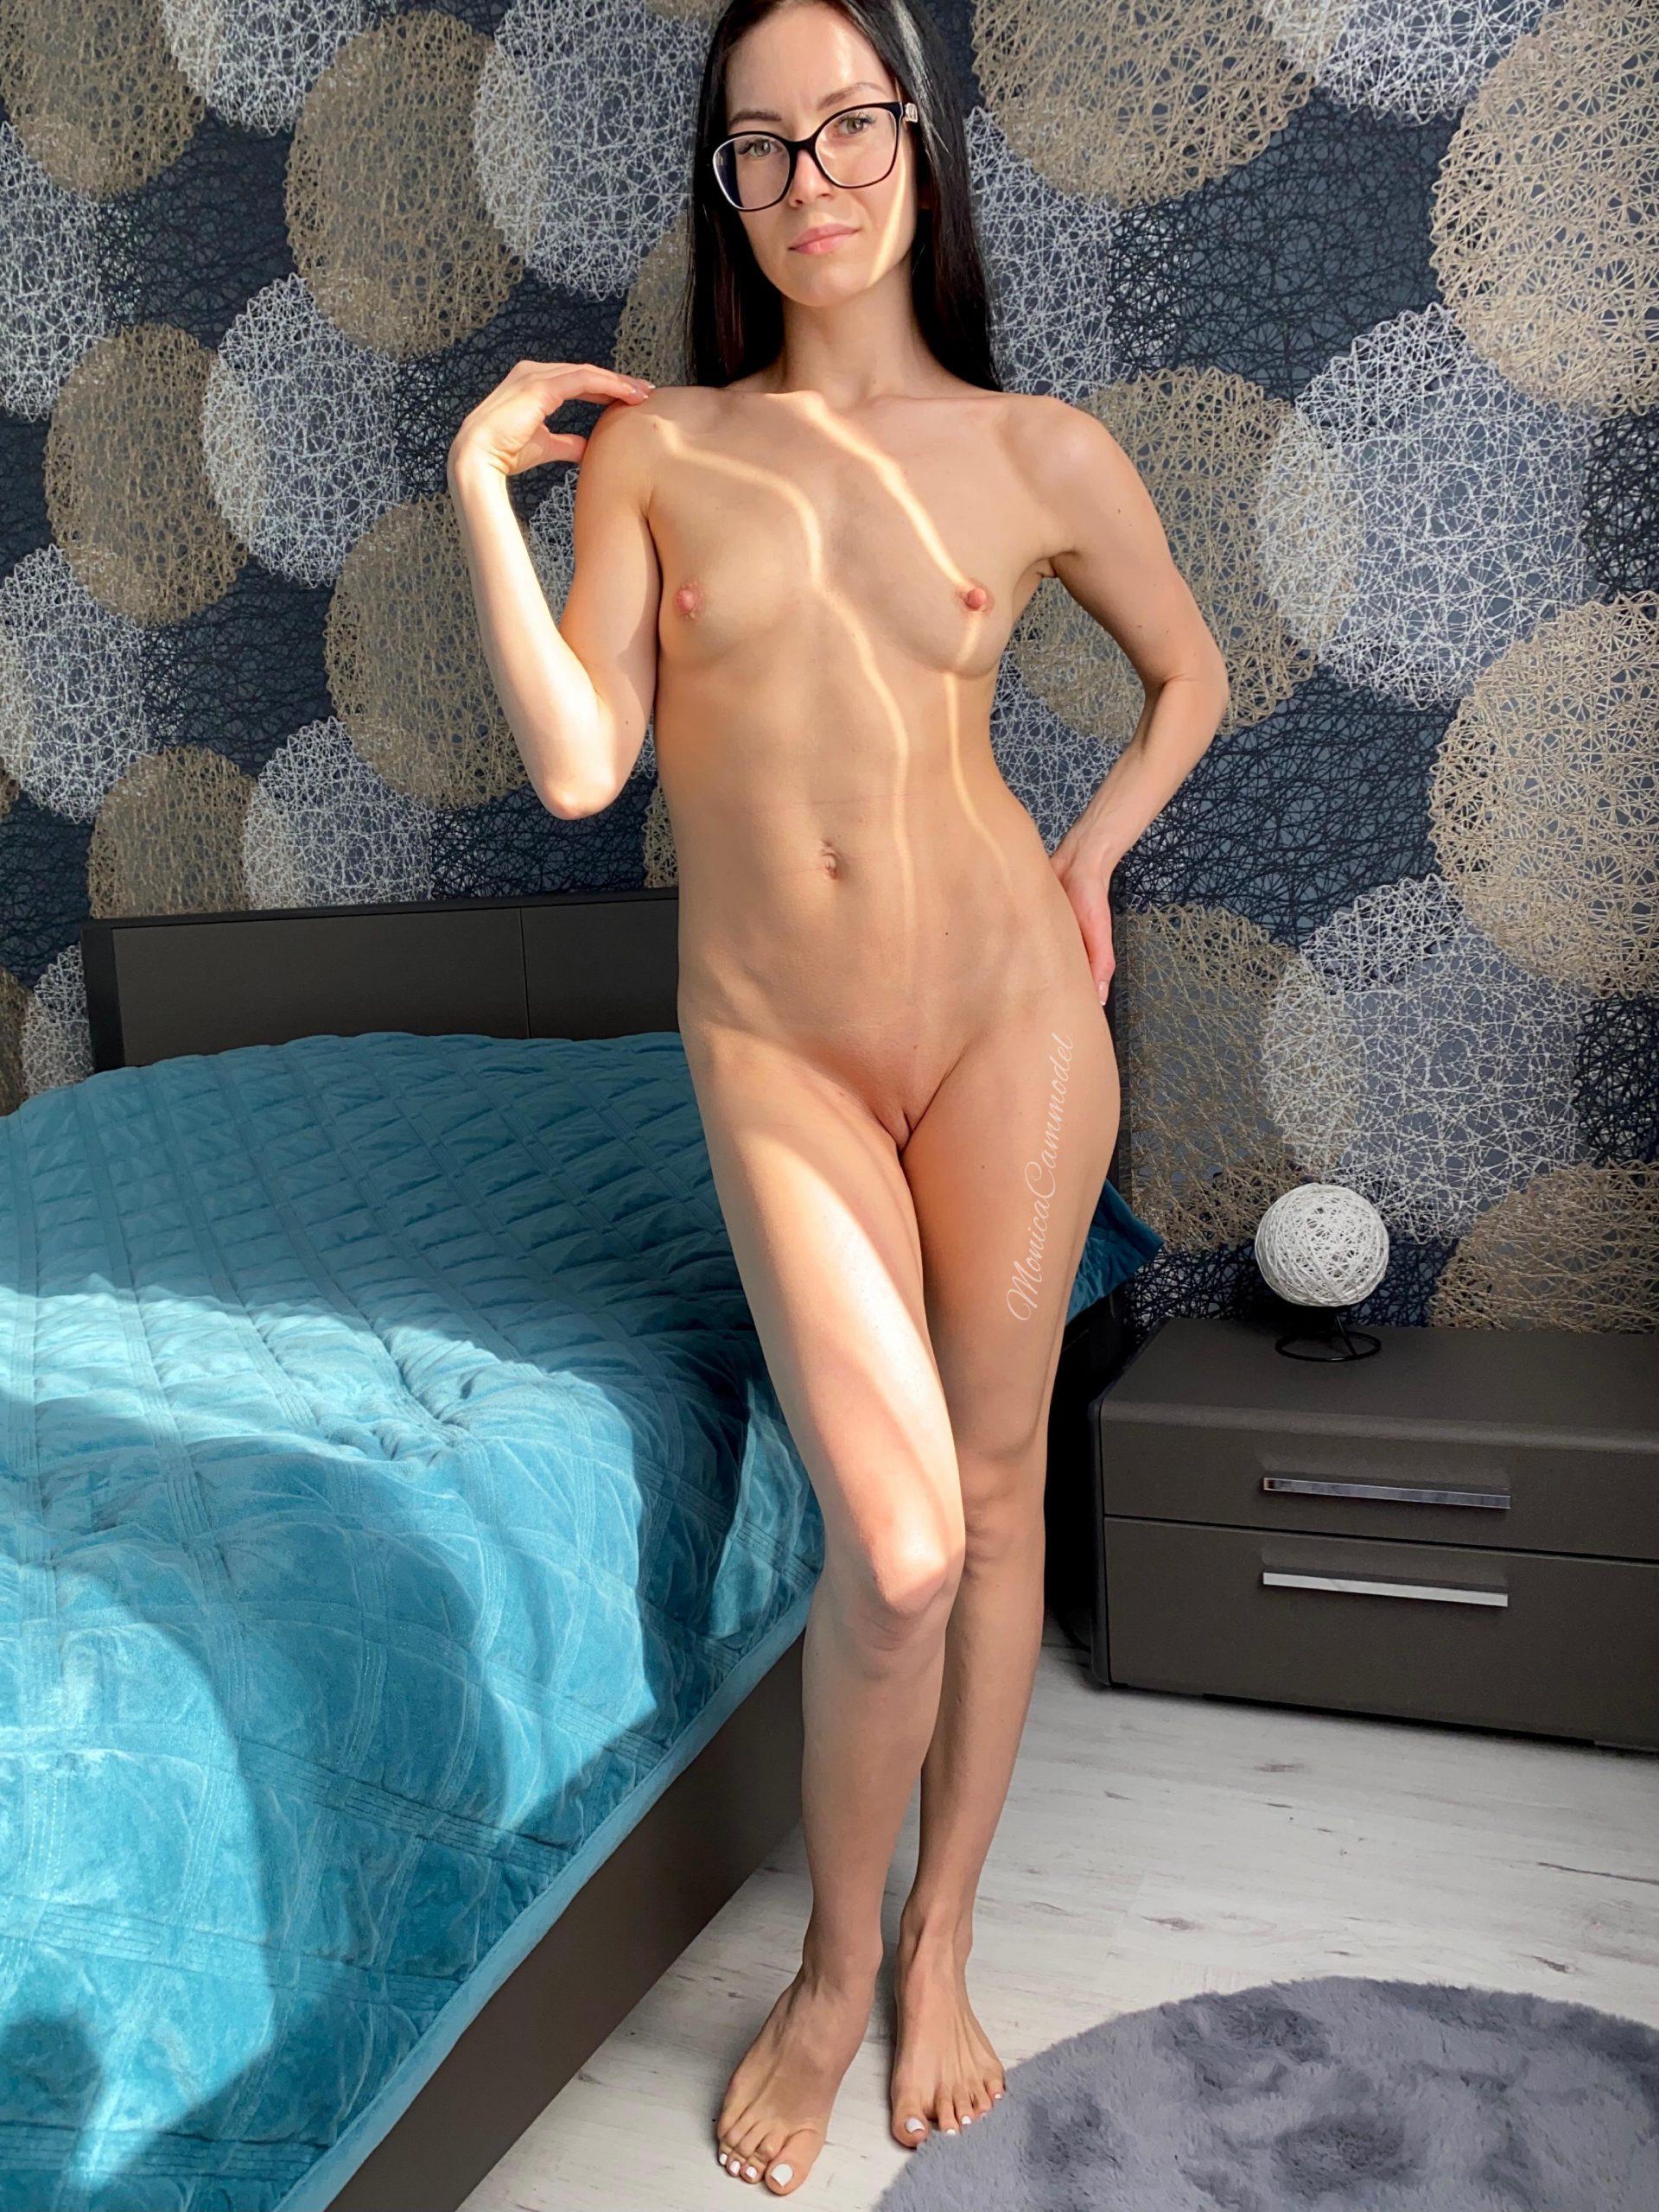 Do You Like Petite Naked Russian Girls?)